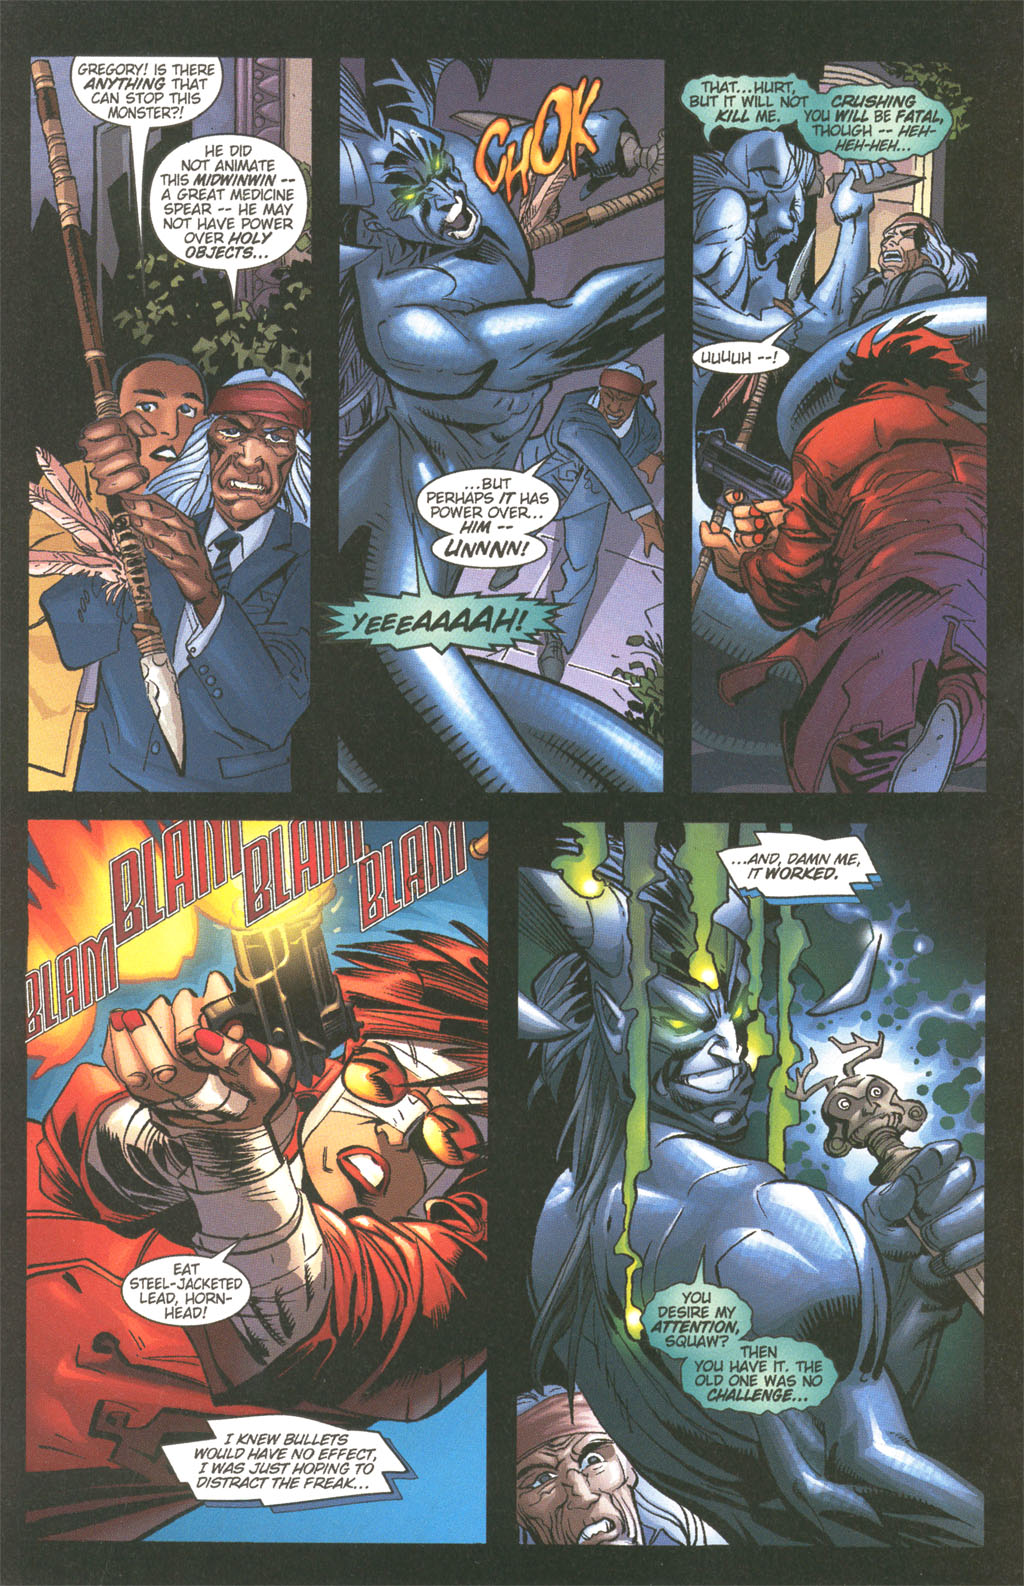 Read online Painkiller Jane/Hellboy comic -  Issue # Full - 14